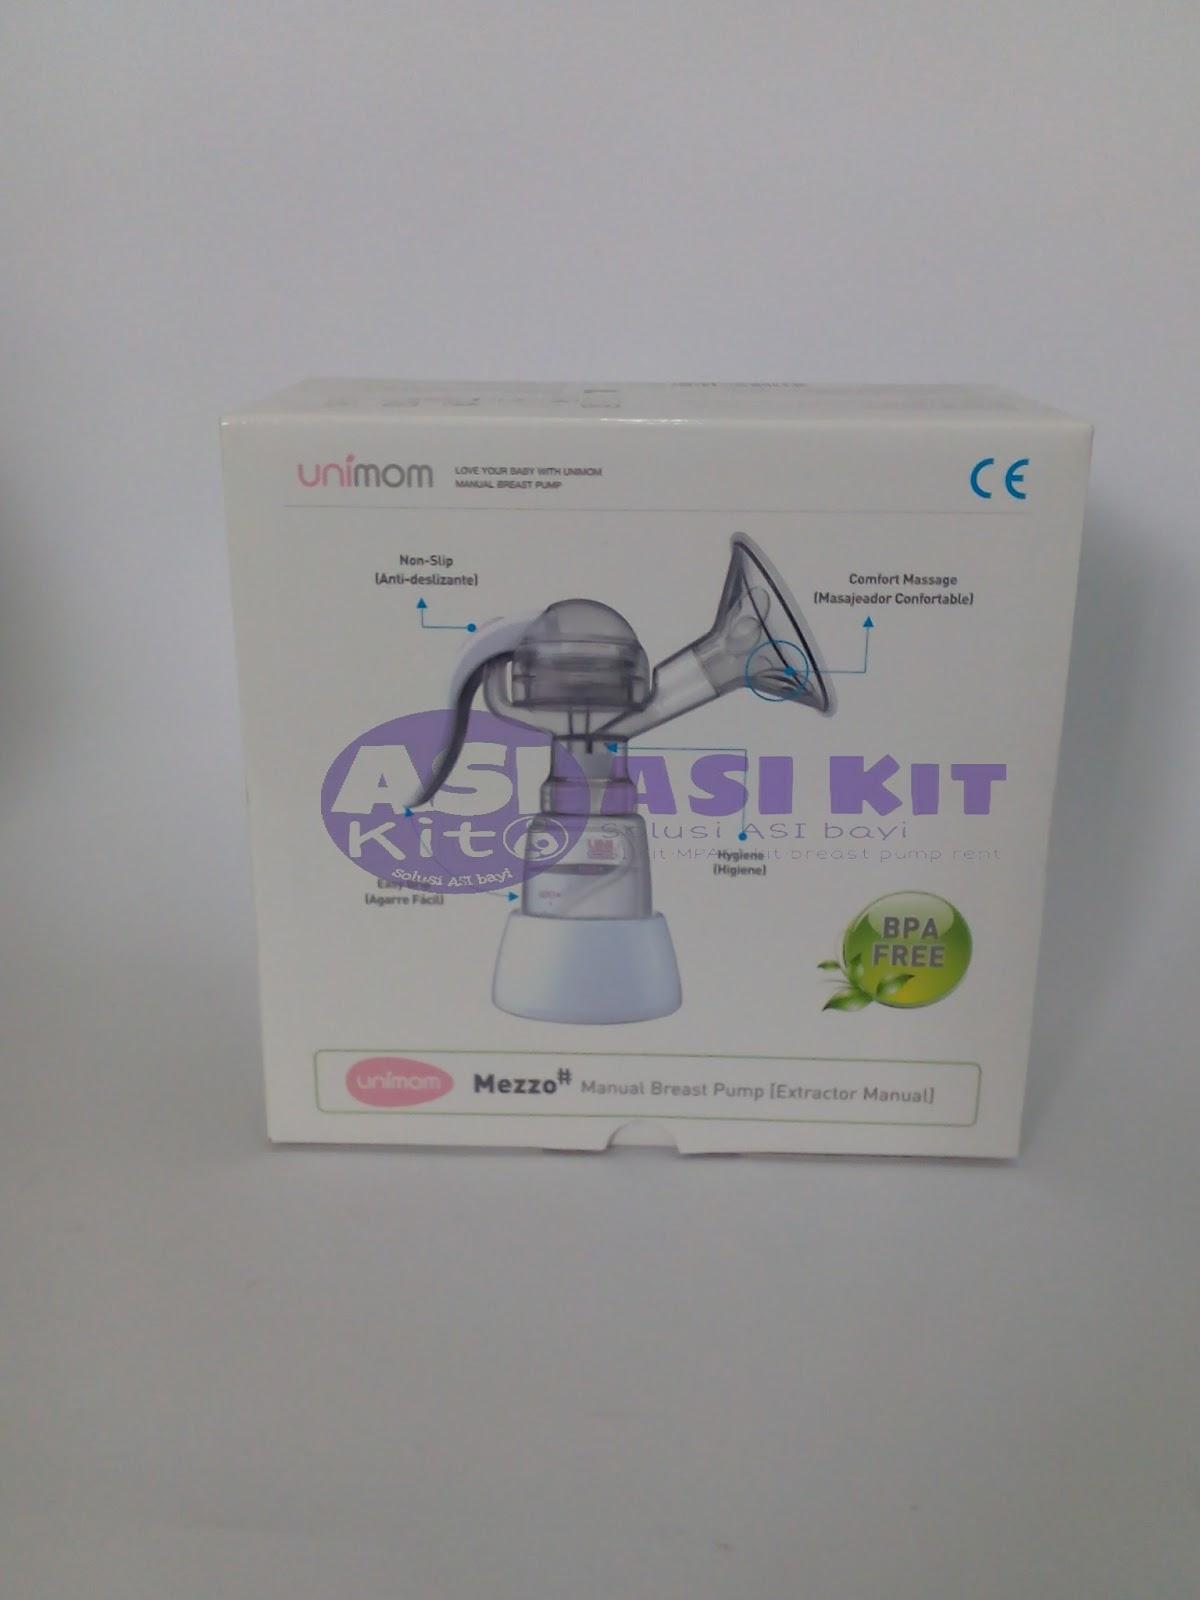 Pompa Asi Solo Breast Pump Manual Little Giant Emily 1 Pcs Badan 2 Tuas 3 Diafragma 4 Botol 5 Valve 6 Cover Free Kantong Thermal Sensor